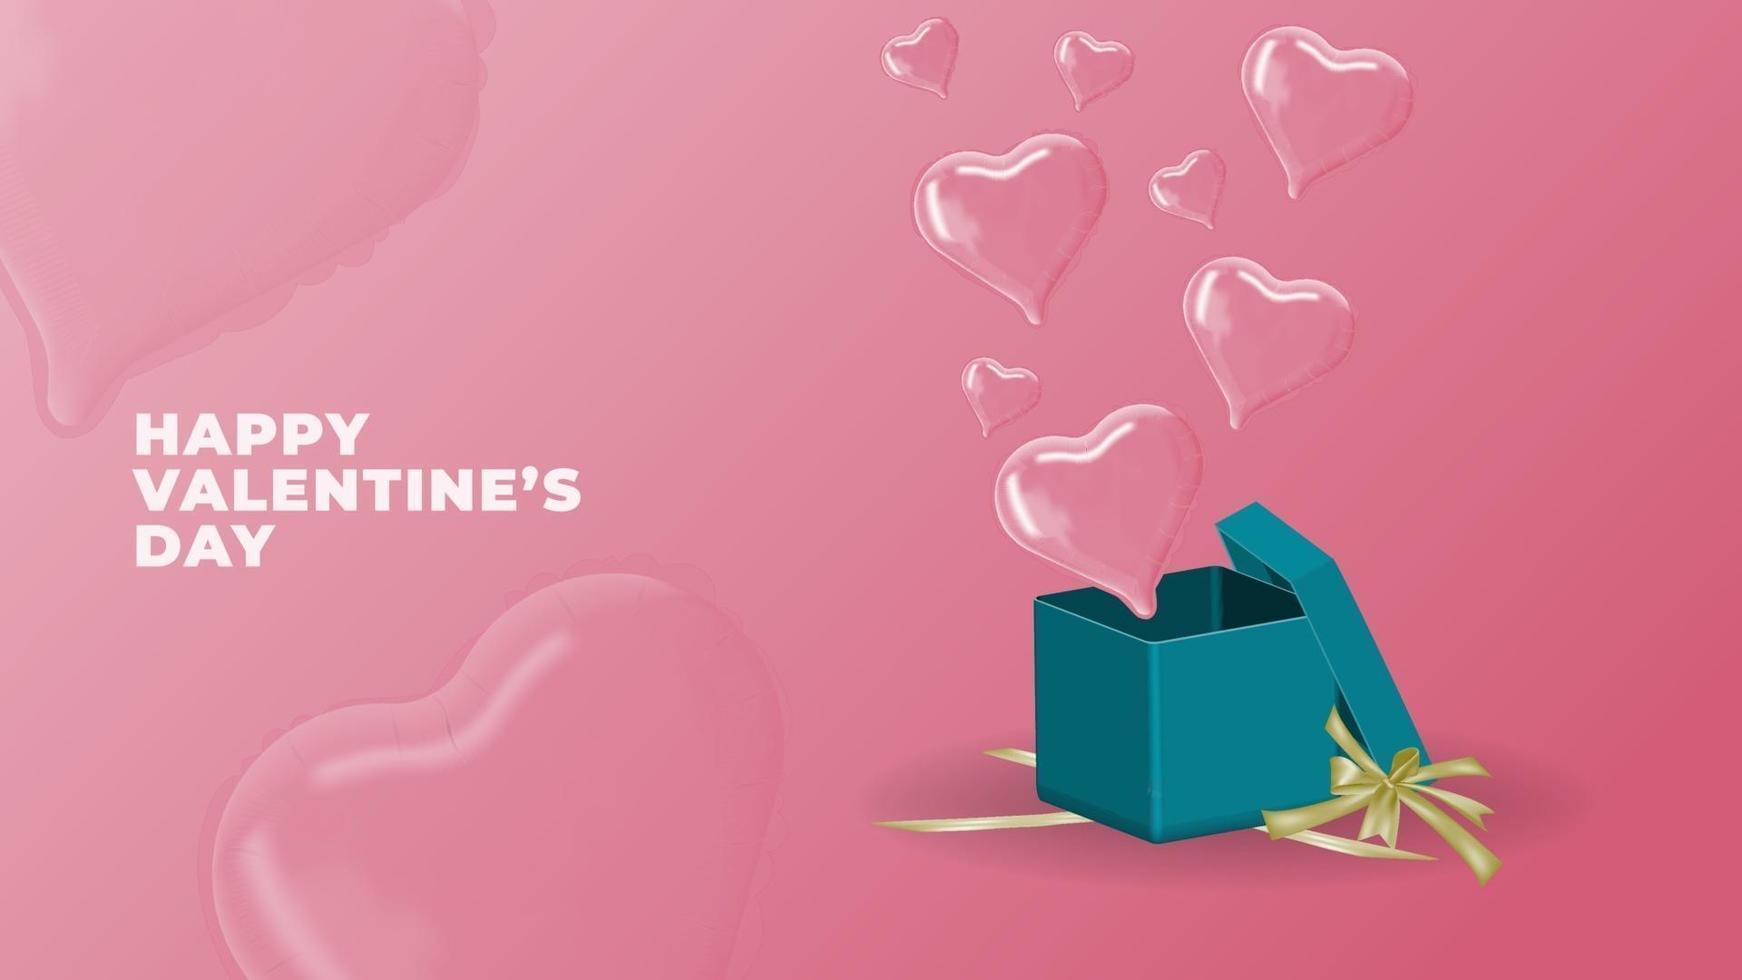 joyeuse saint valentin vecteur 3d